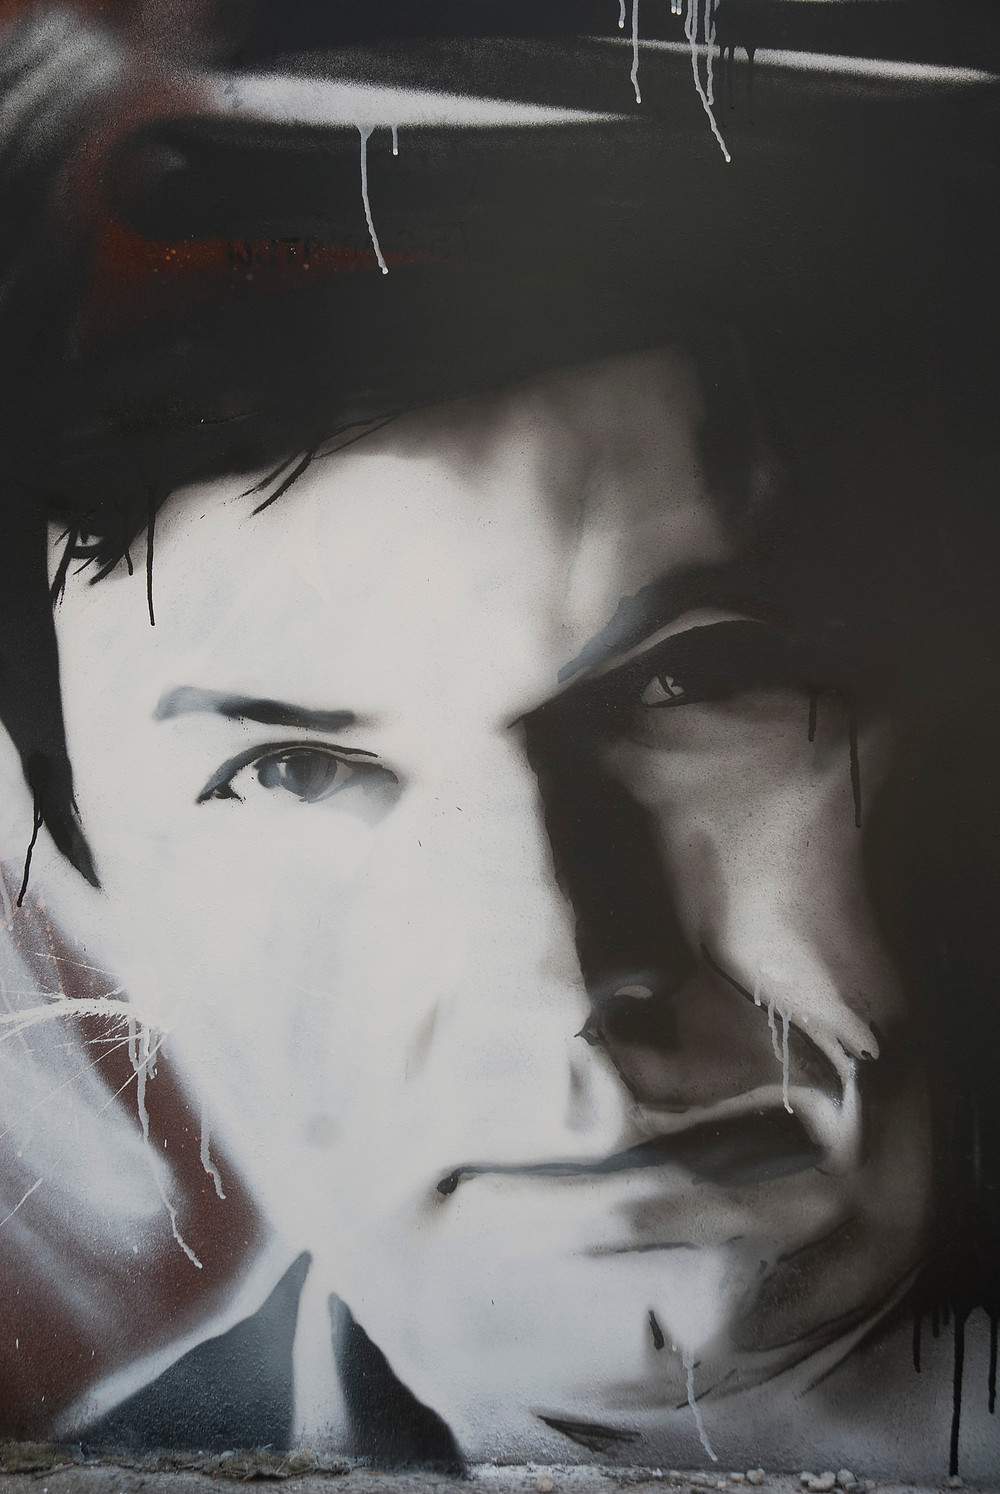 Thomas Piketty, painted portrait ©thierry ehrmann